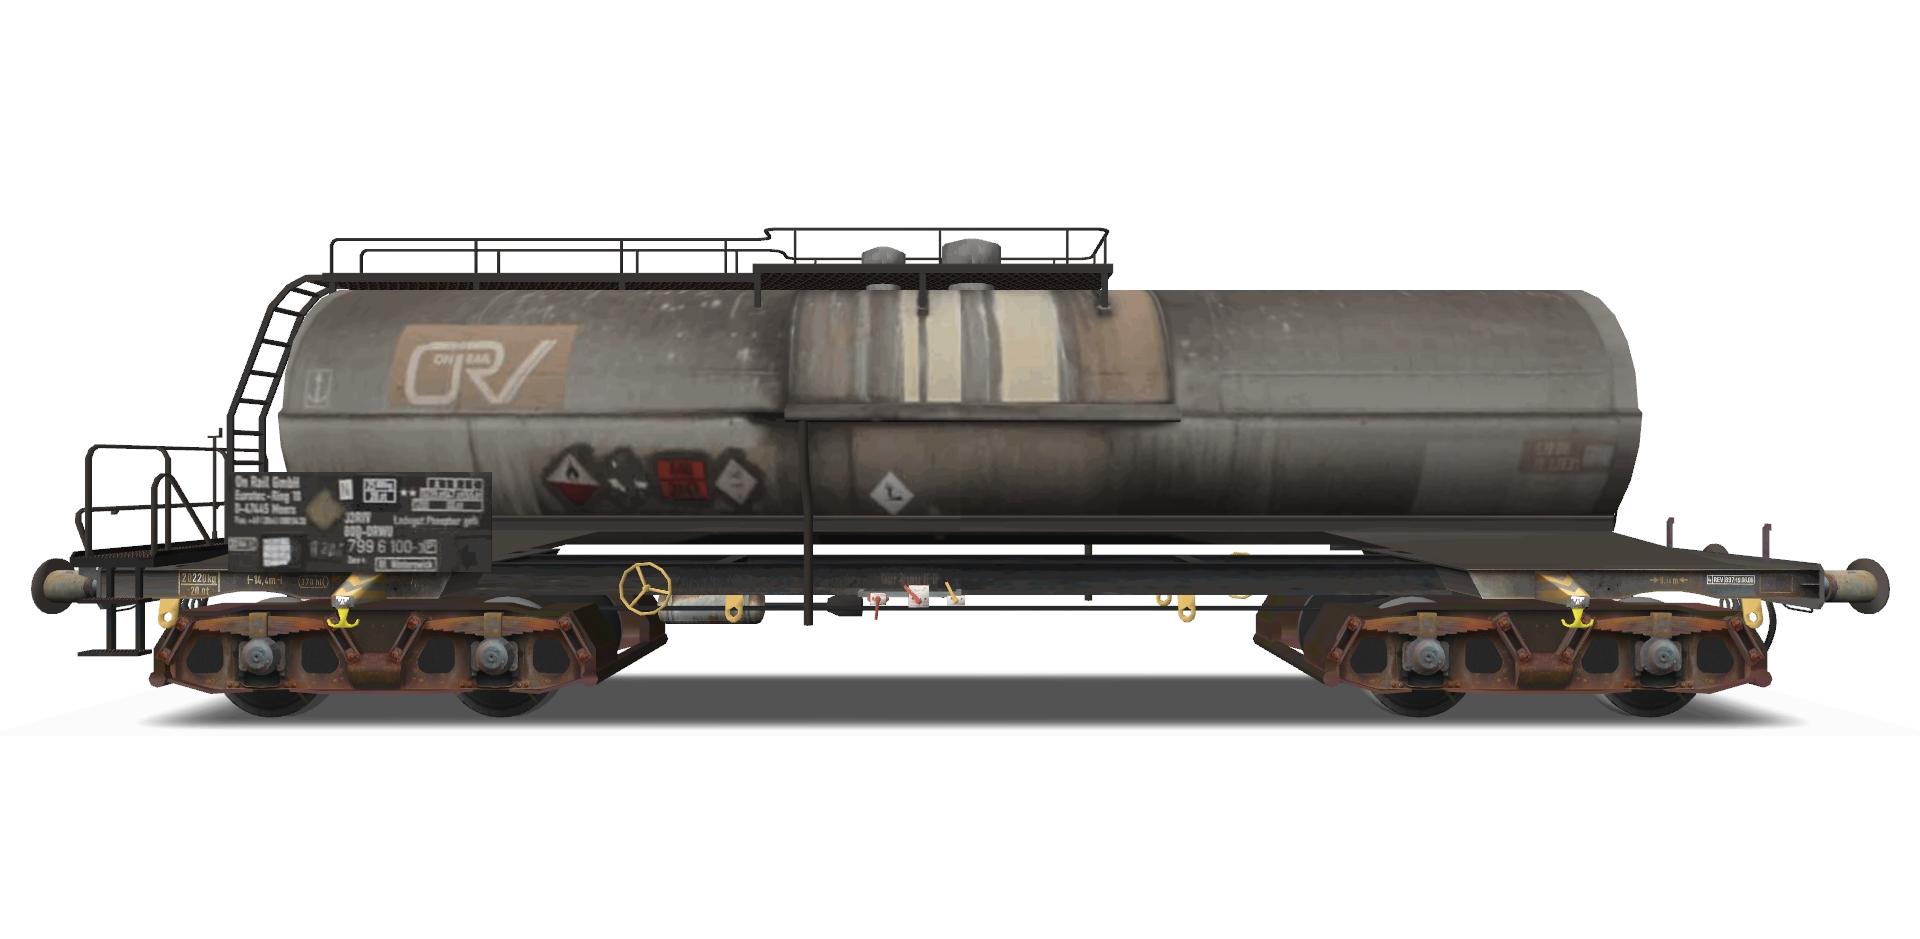 www.trainsimhobby.it/Train-Simulator/Carri-Merci/Aperti-Chiusi/D-ORWU_Zacefns_BTS.jpg